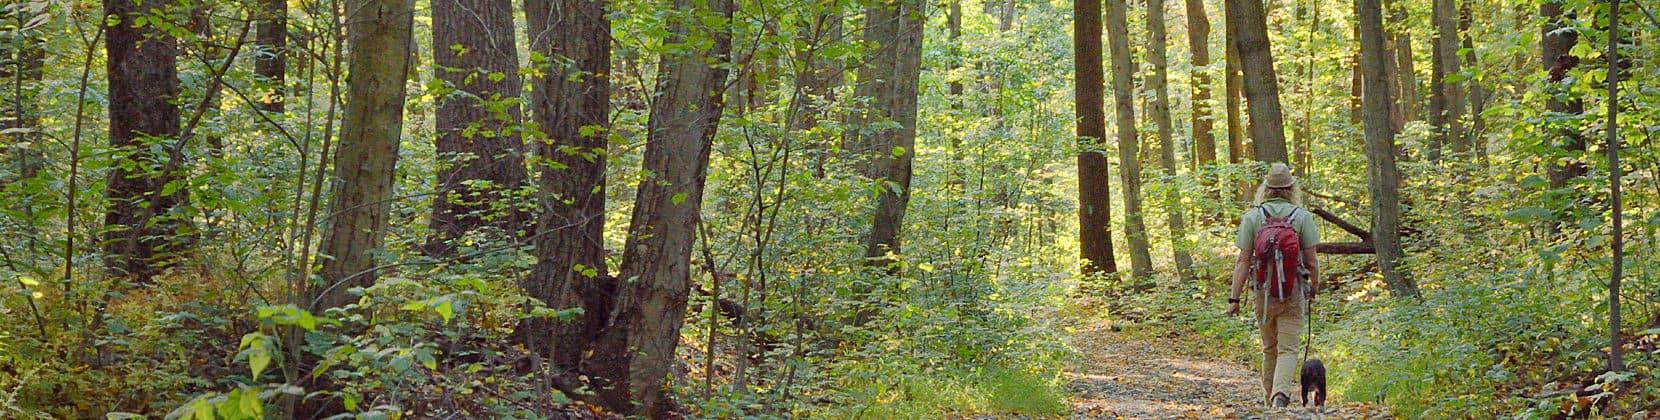 Hiker at French Creek